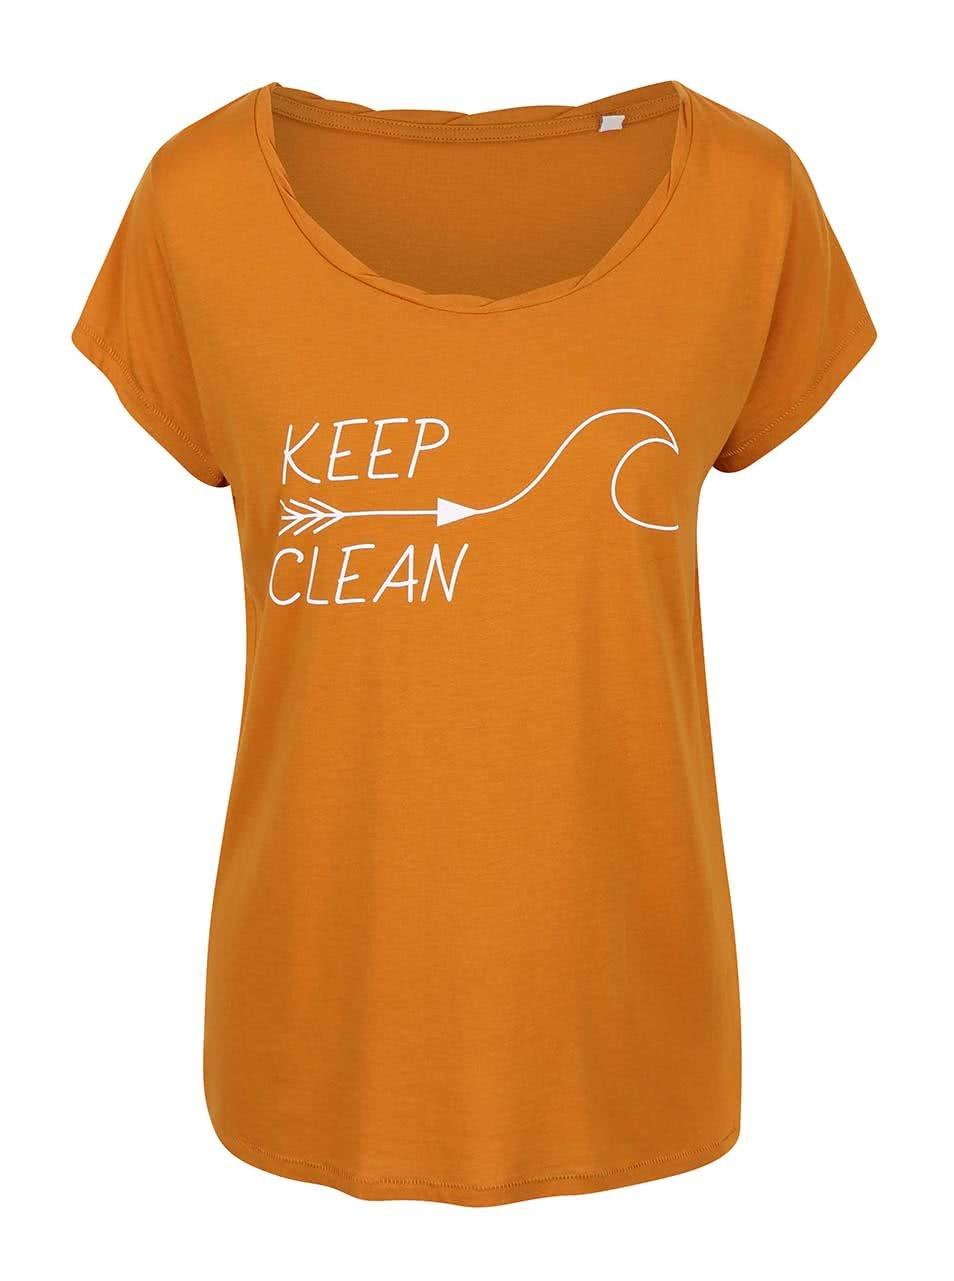 """Dobré"" hořčicové dámské tričko KEEPItCLEAN"